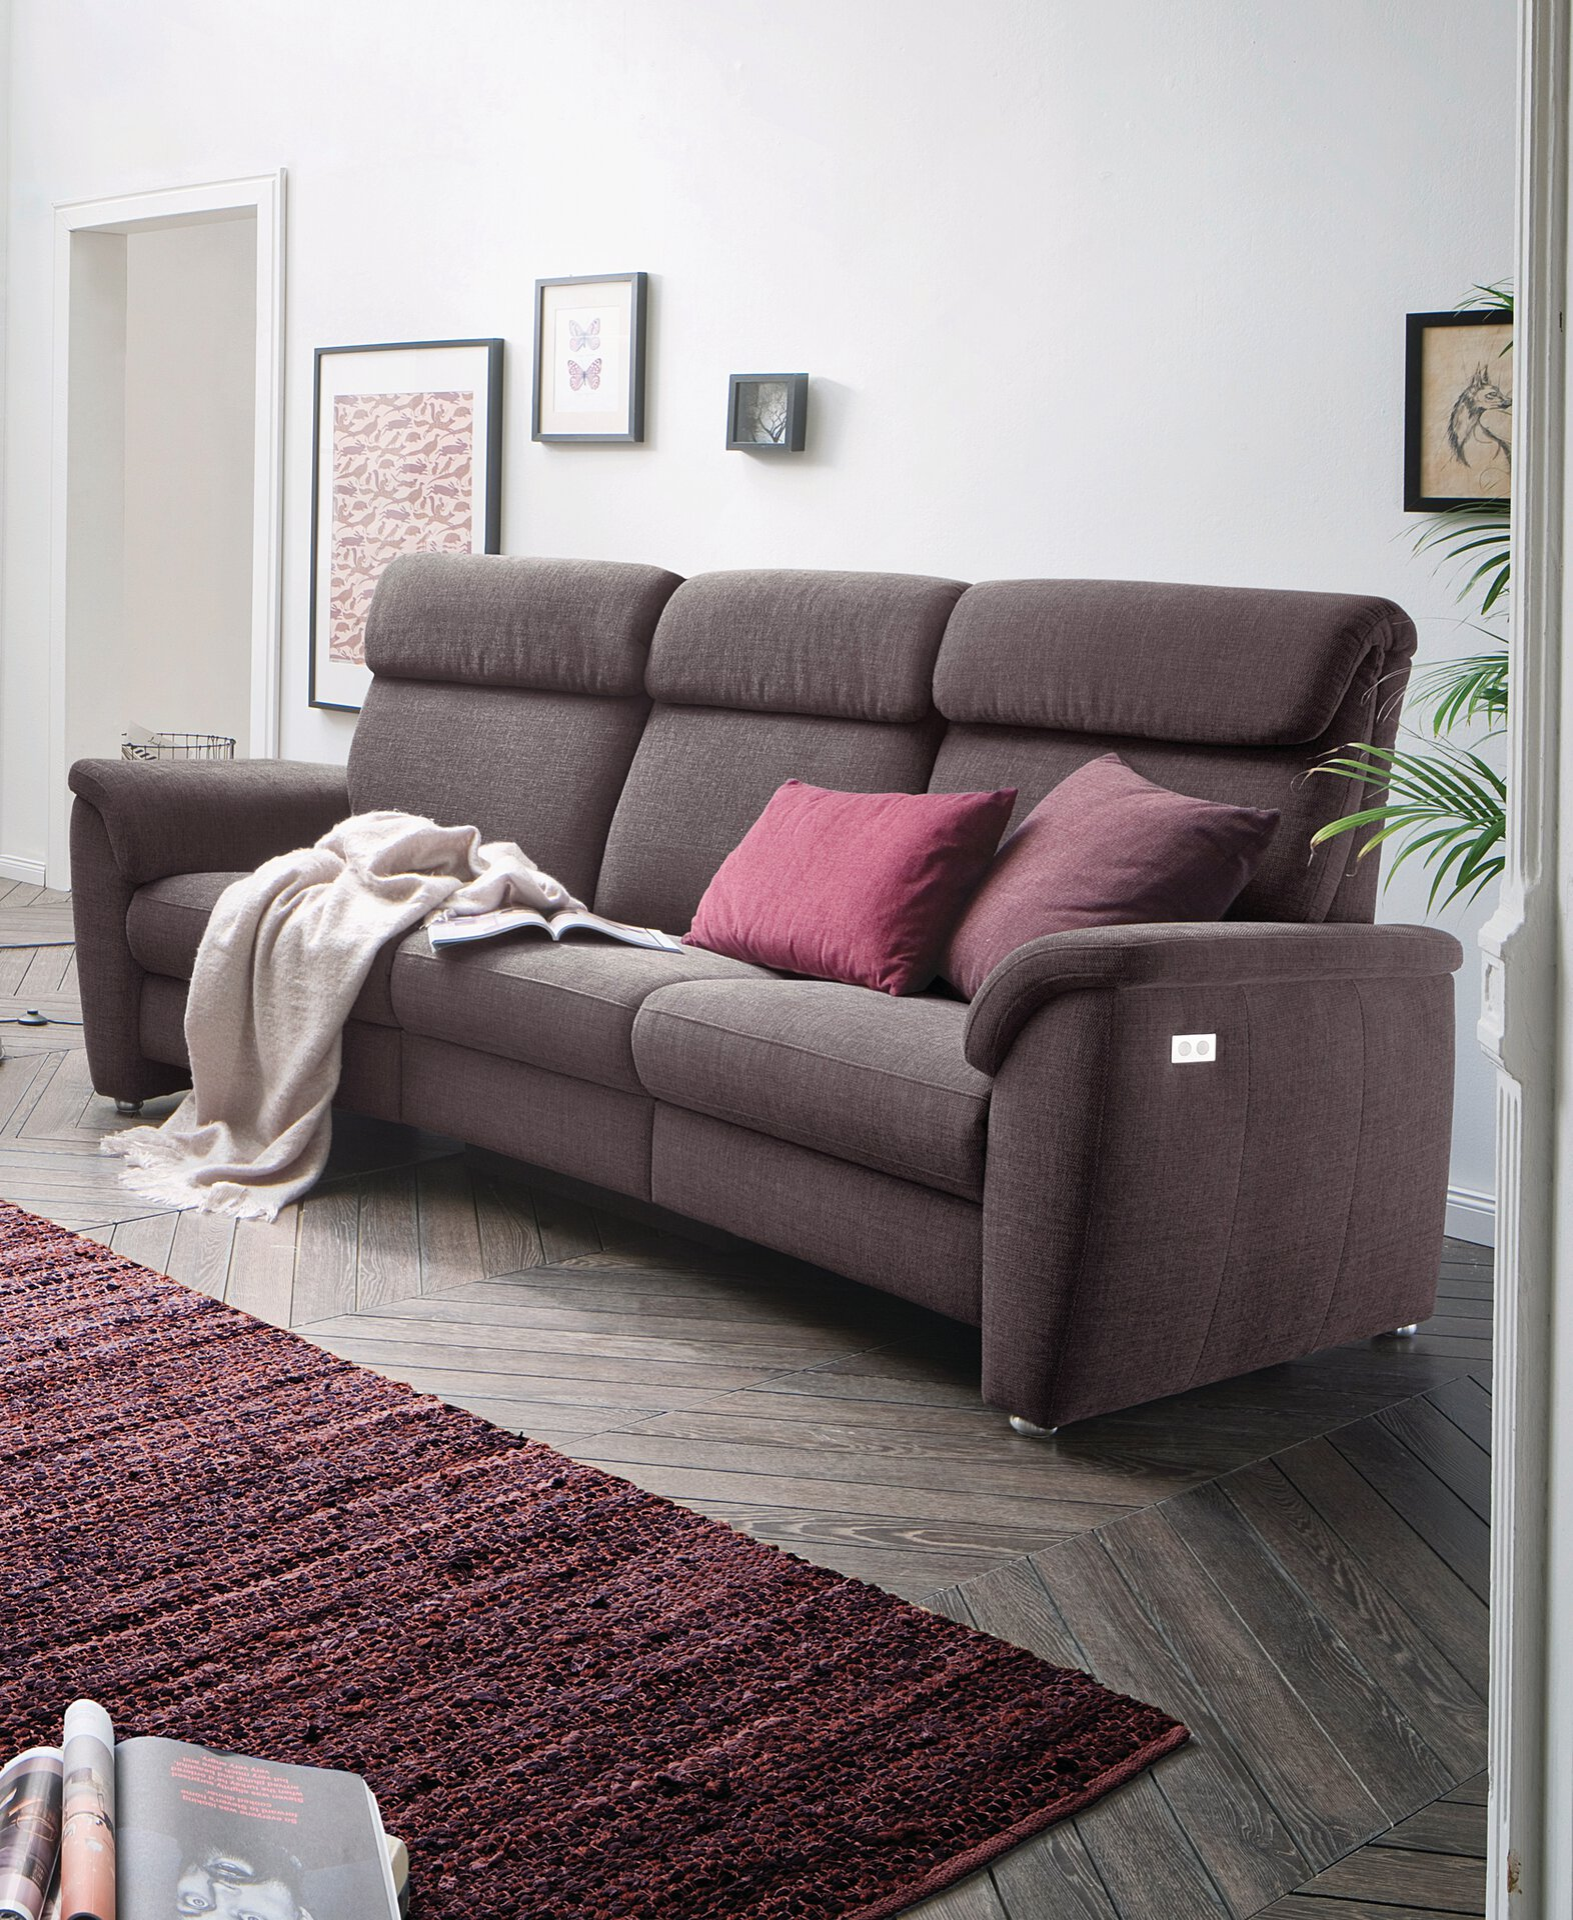 Sofa 3-Sitzer VOLLEY Vito Textil grau